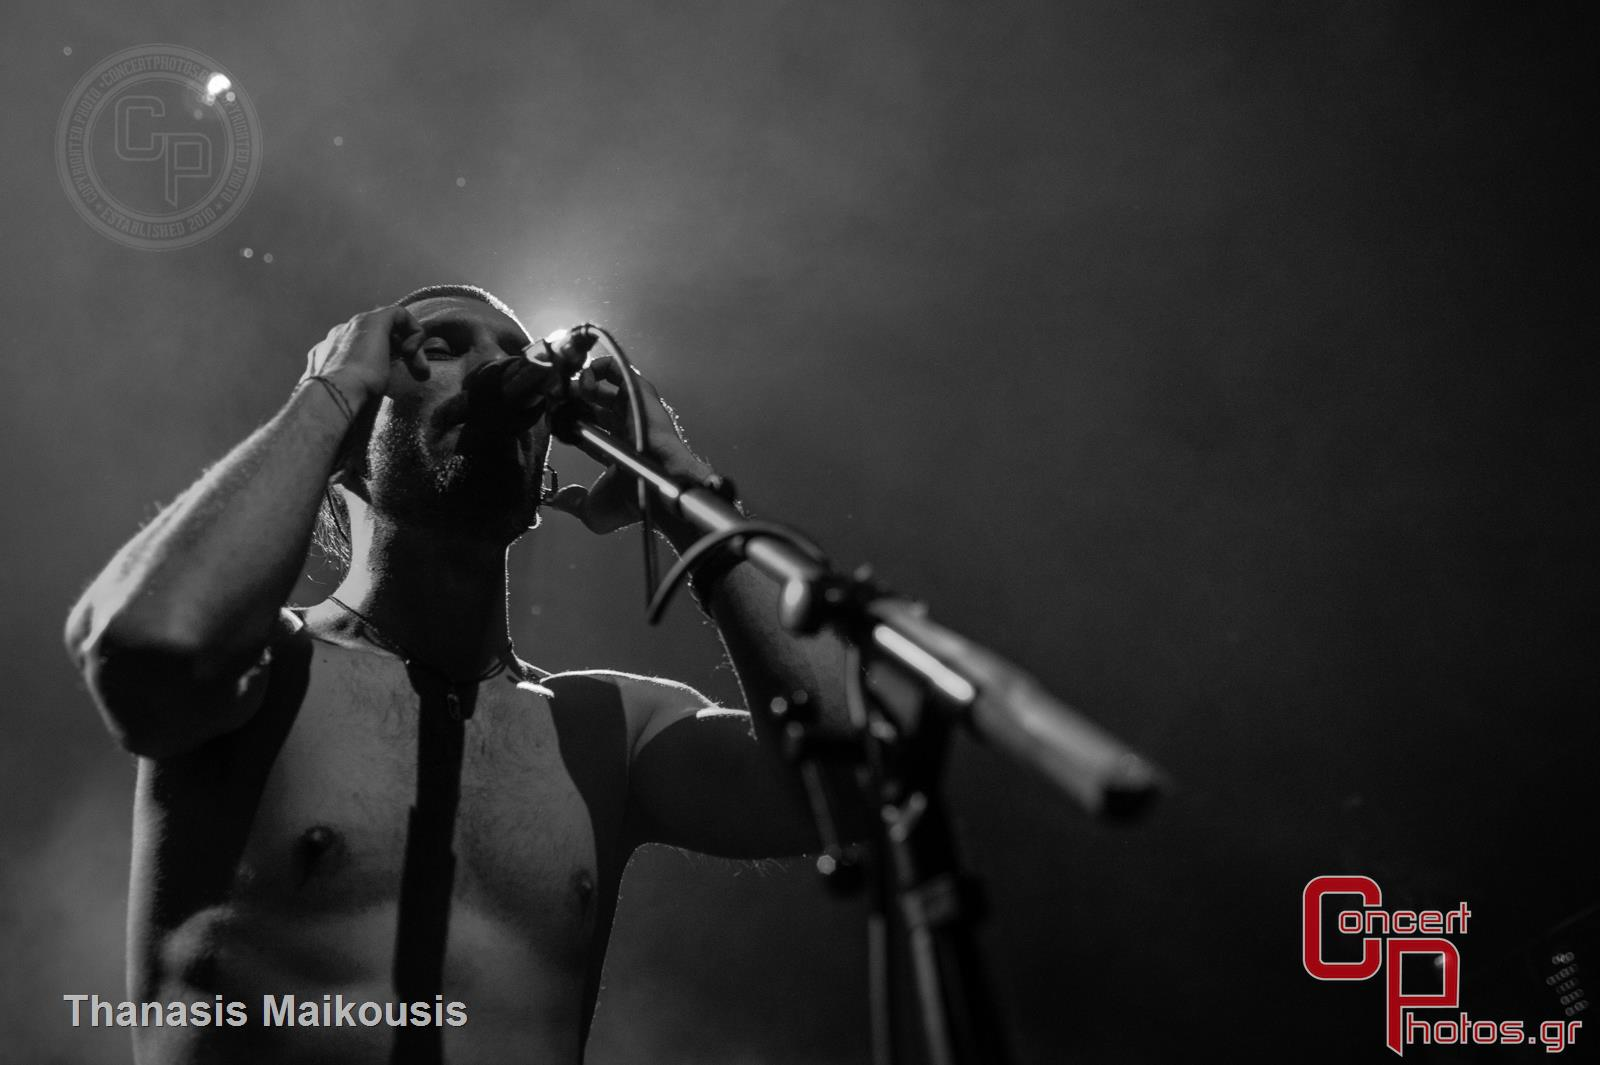 Villagers Of Ioannina City (V.I.C.) & Smallman-Villagers Of Ioannina City (V.I.C.) Smallman photographer: Thanasis Maikousis - concertphotos_20141115_22_20_43